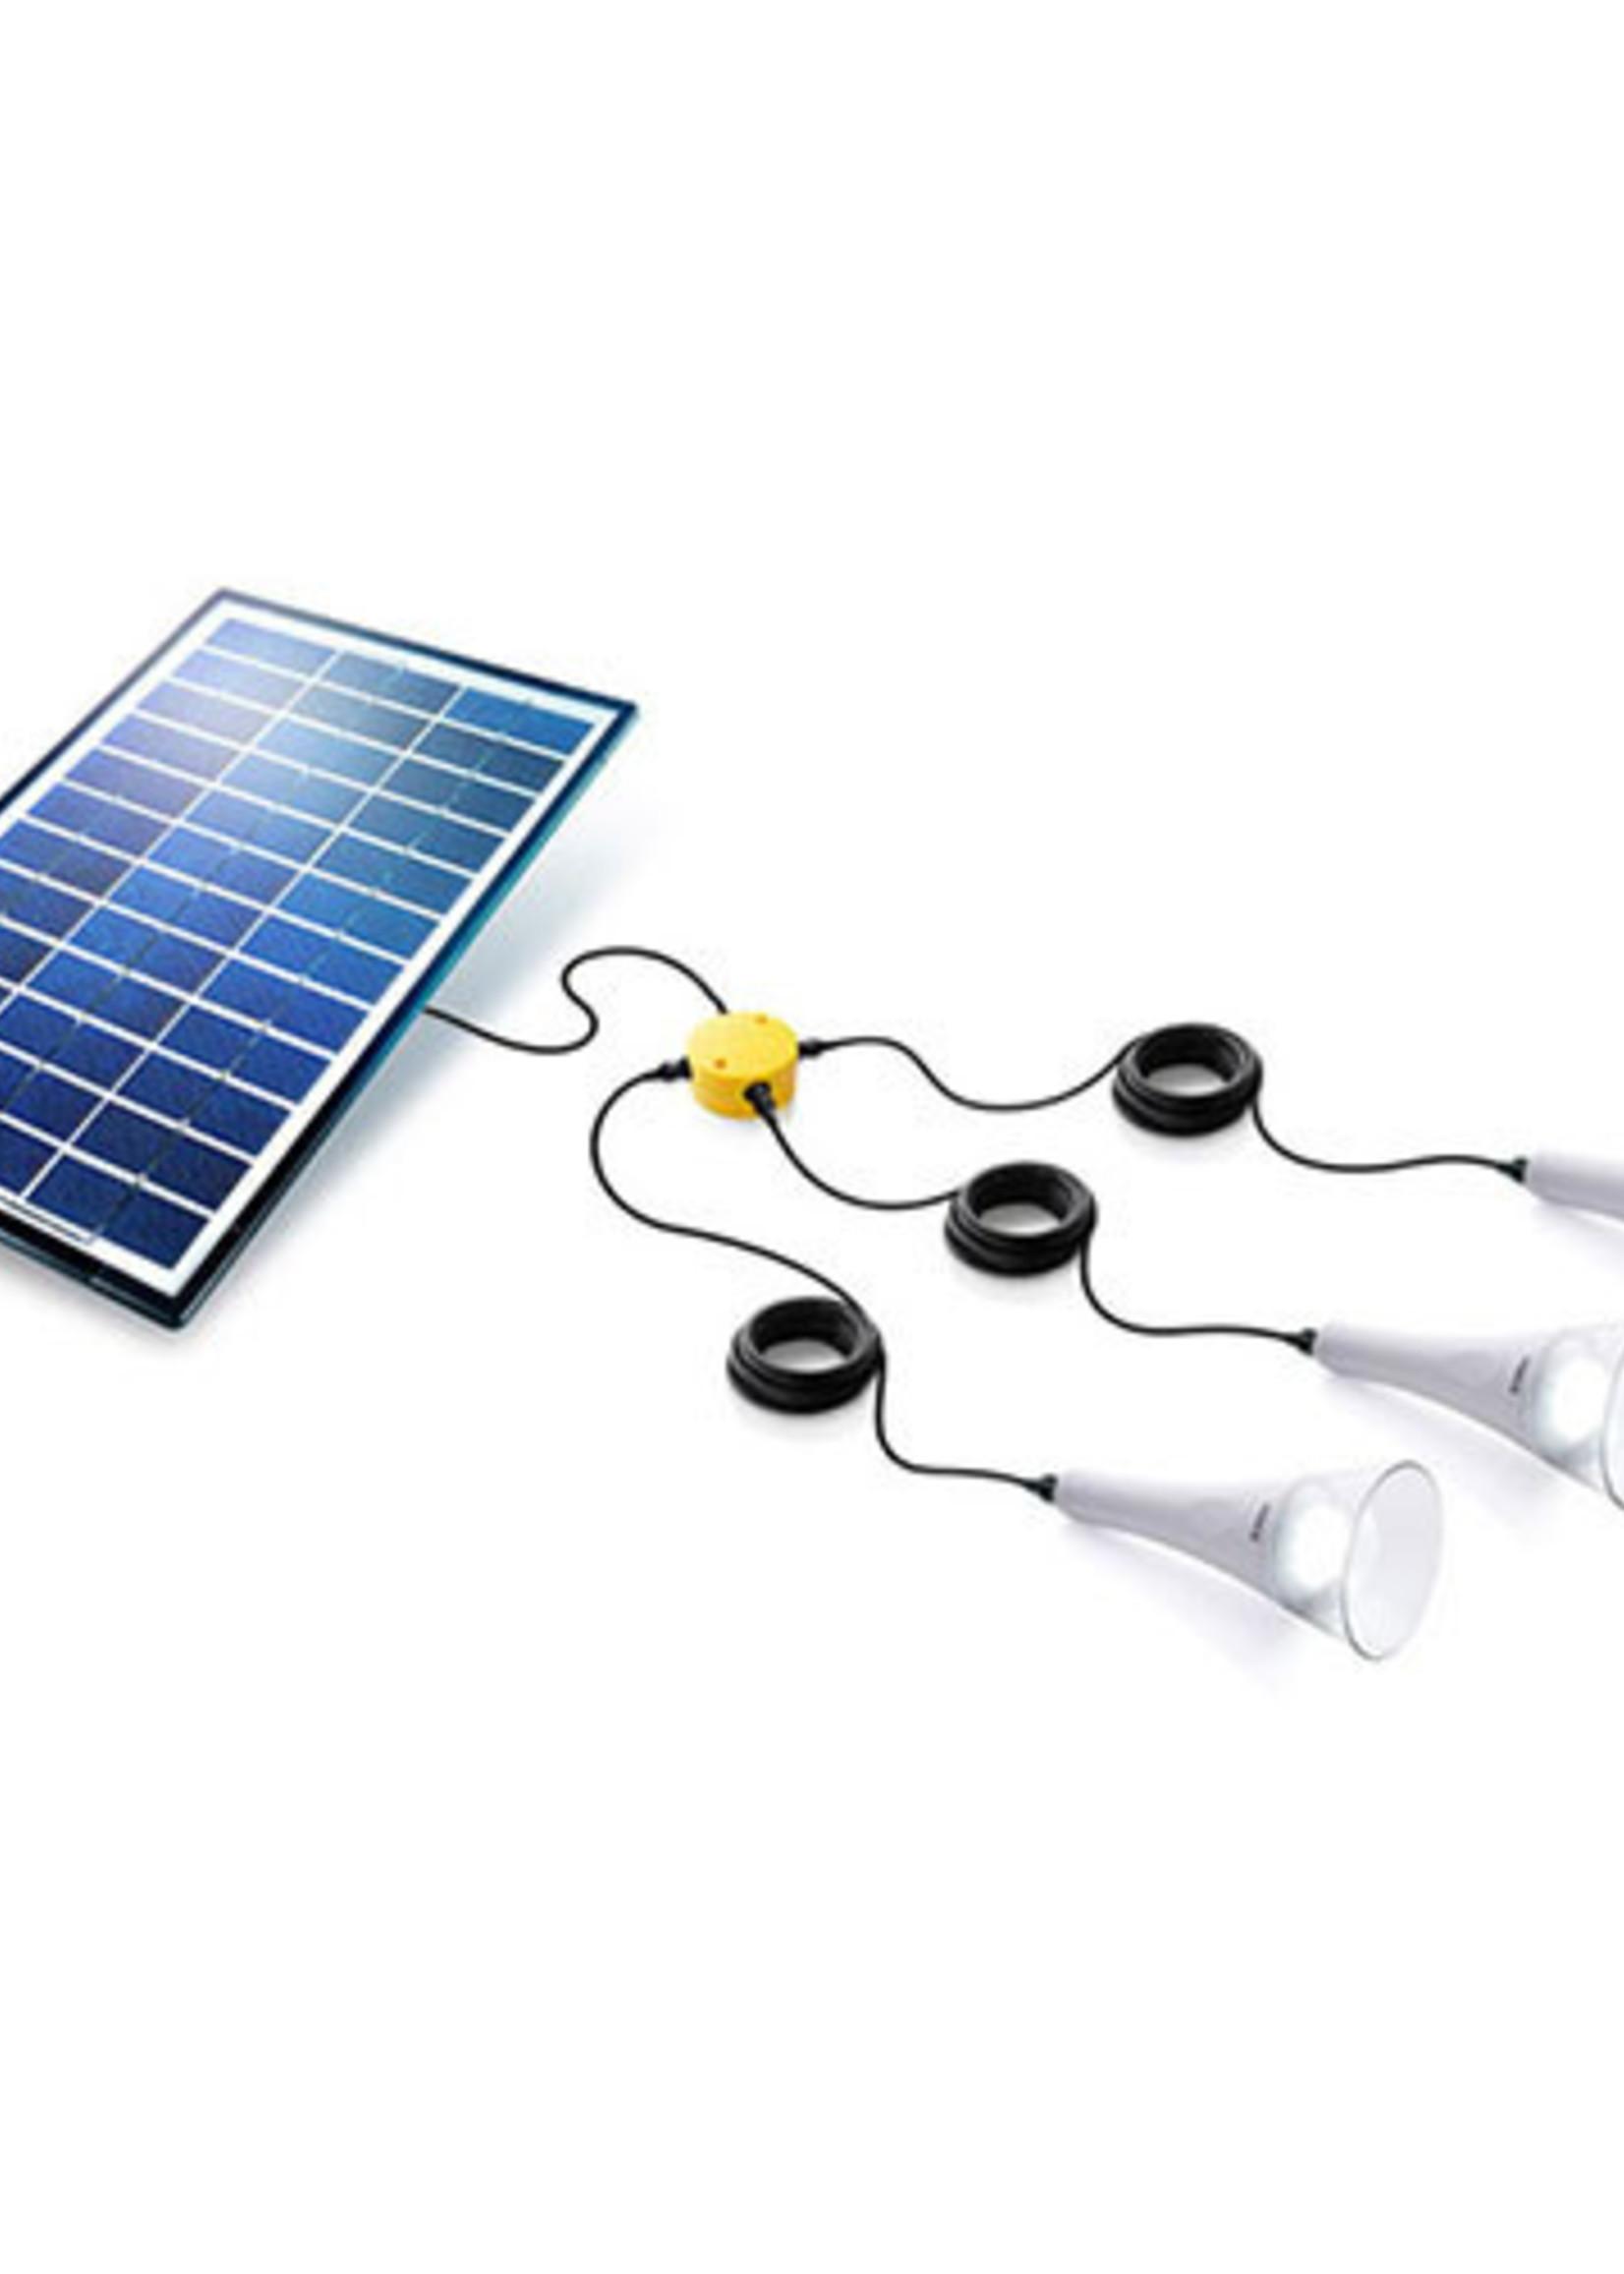 Phaesun Sundaya Lcht + solar